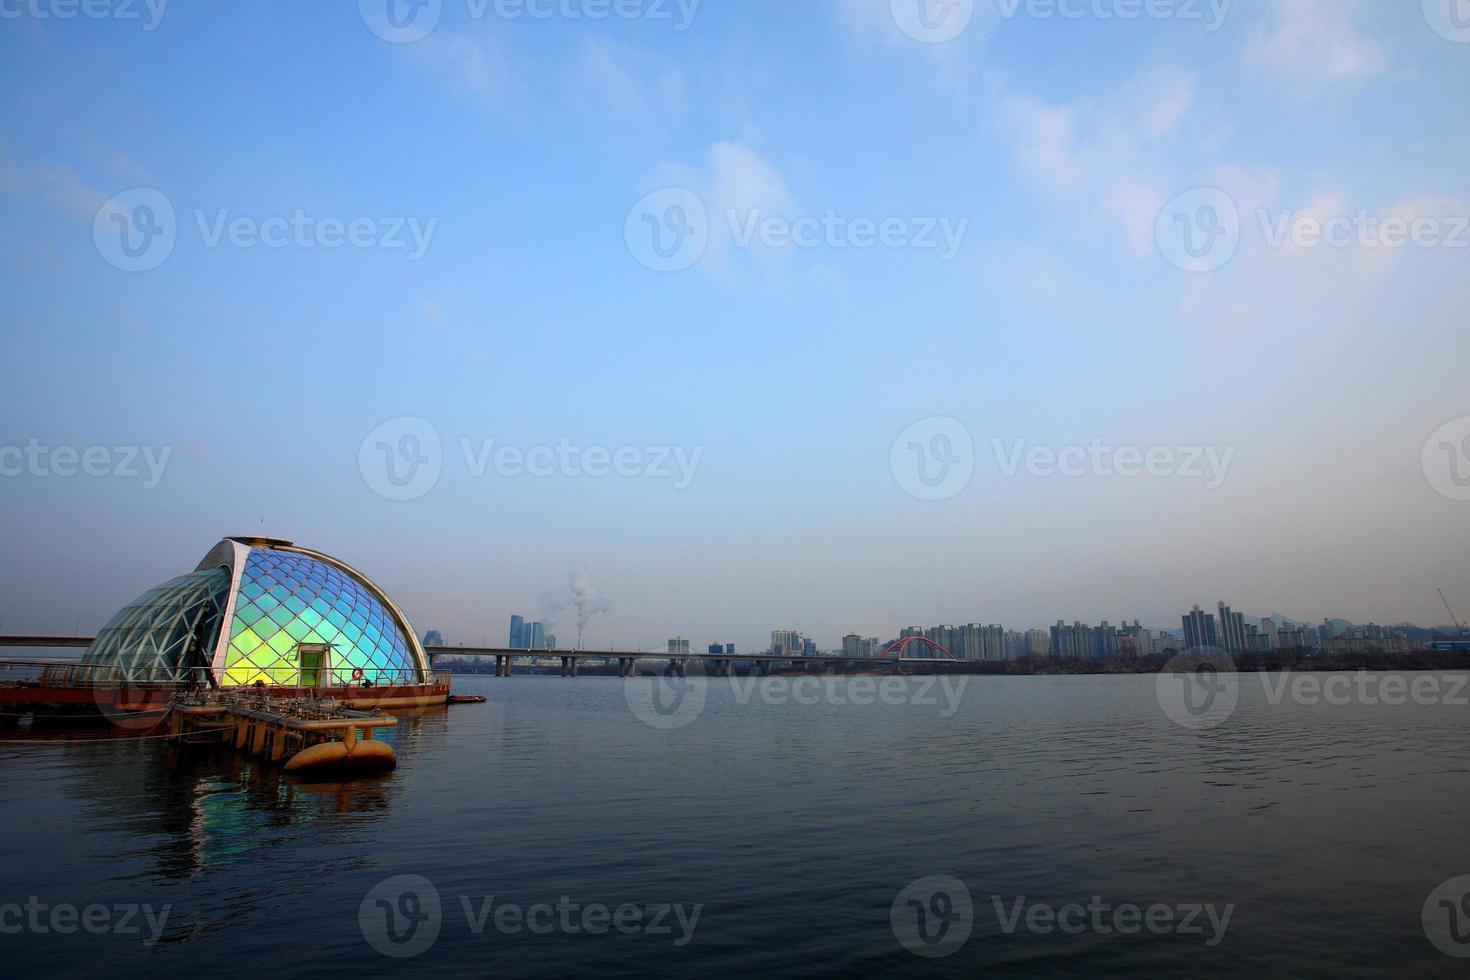 fontana arcobaleno al chiaro di luna foto